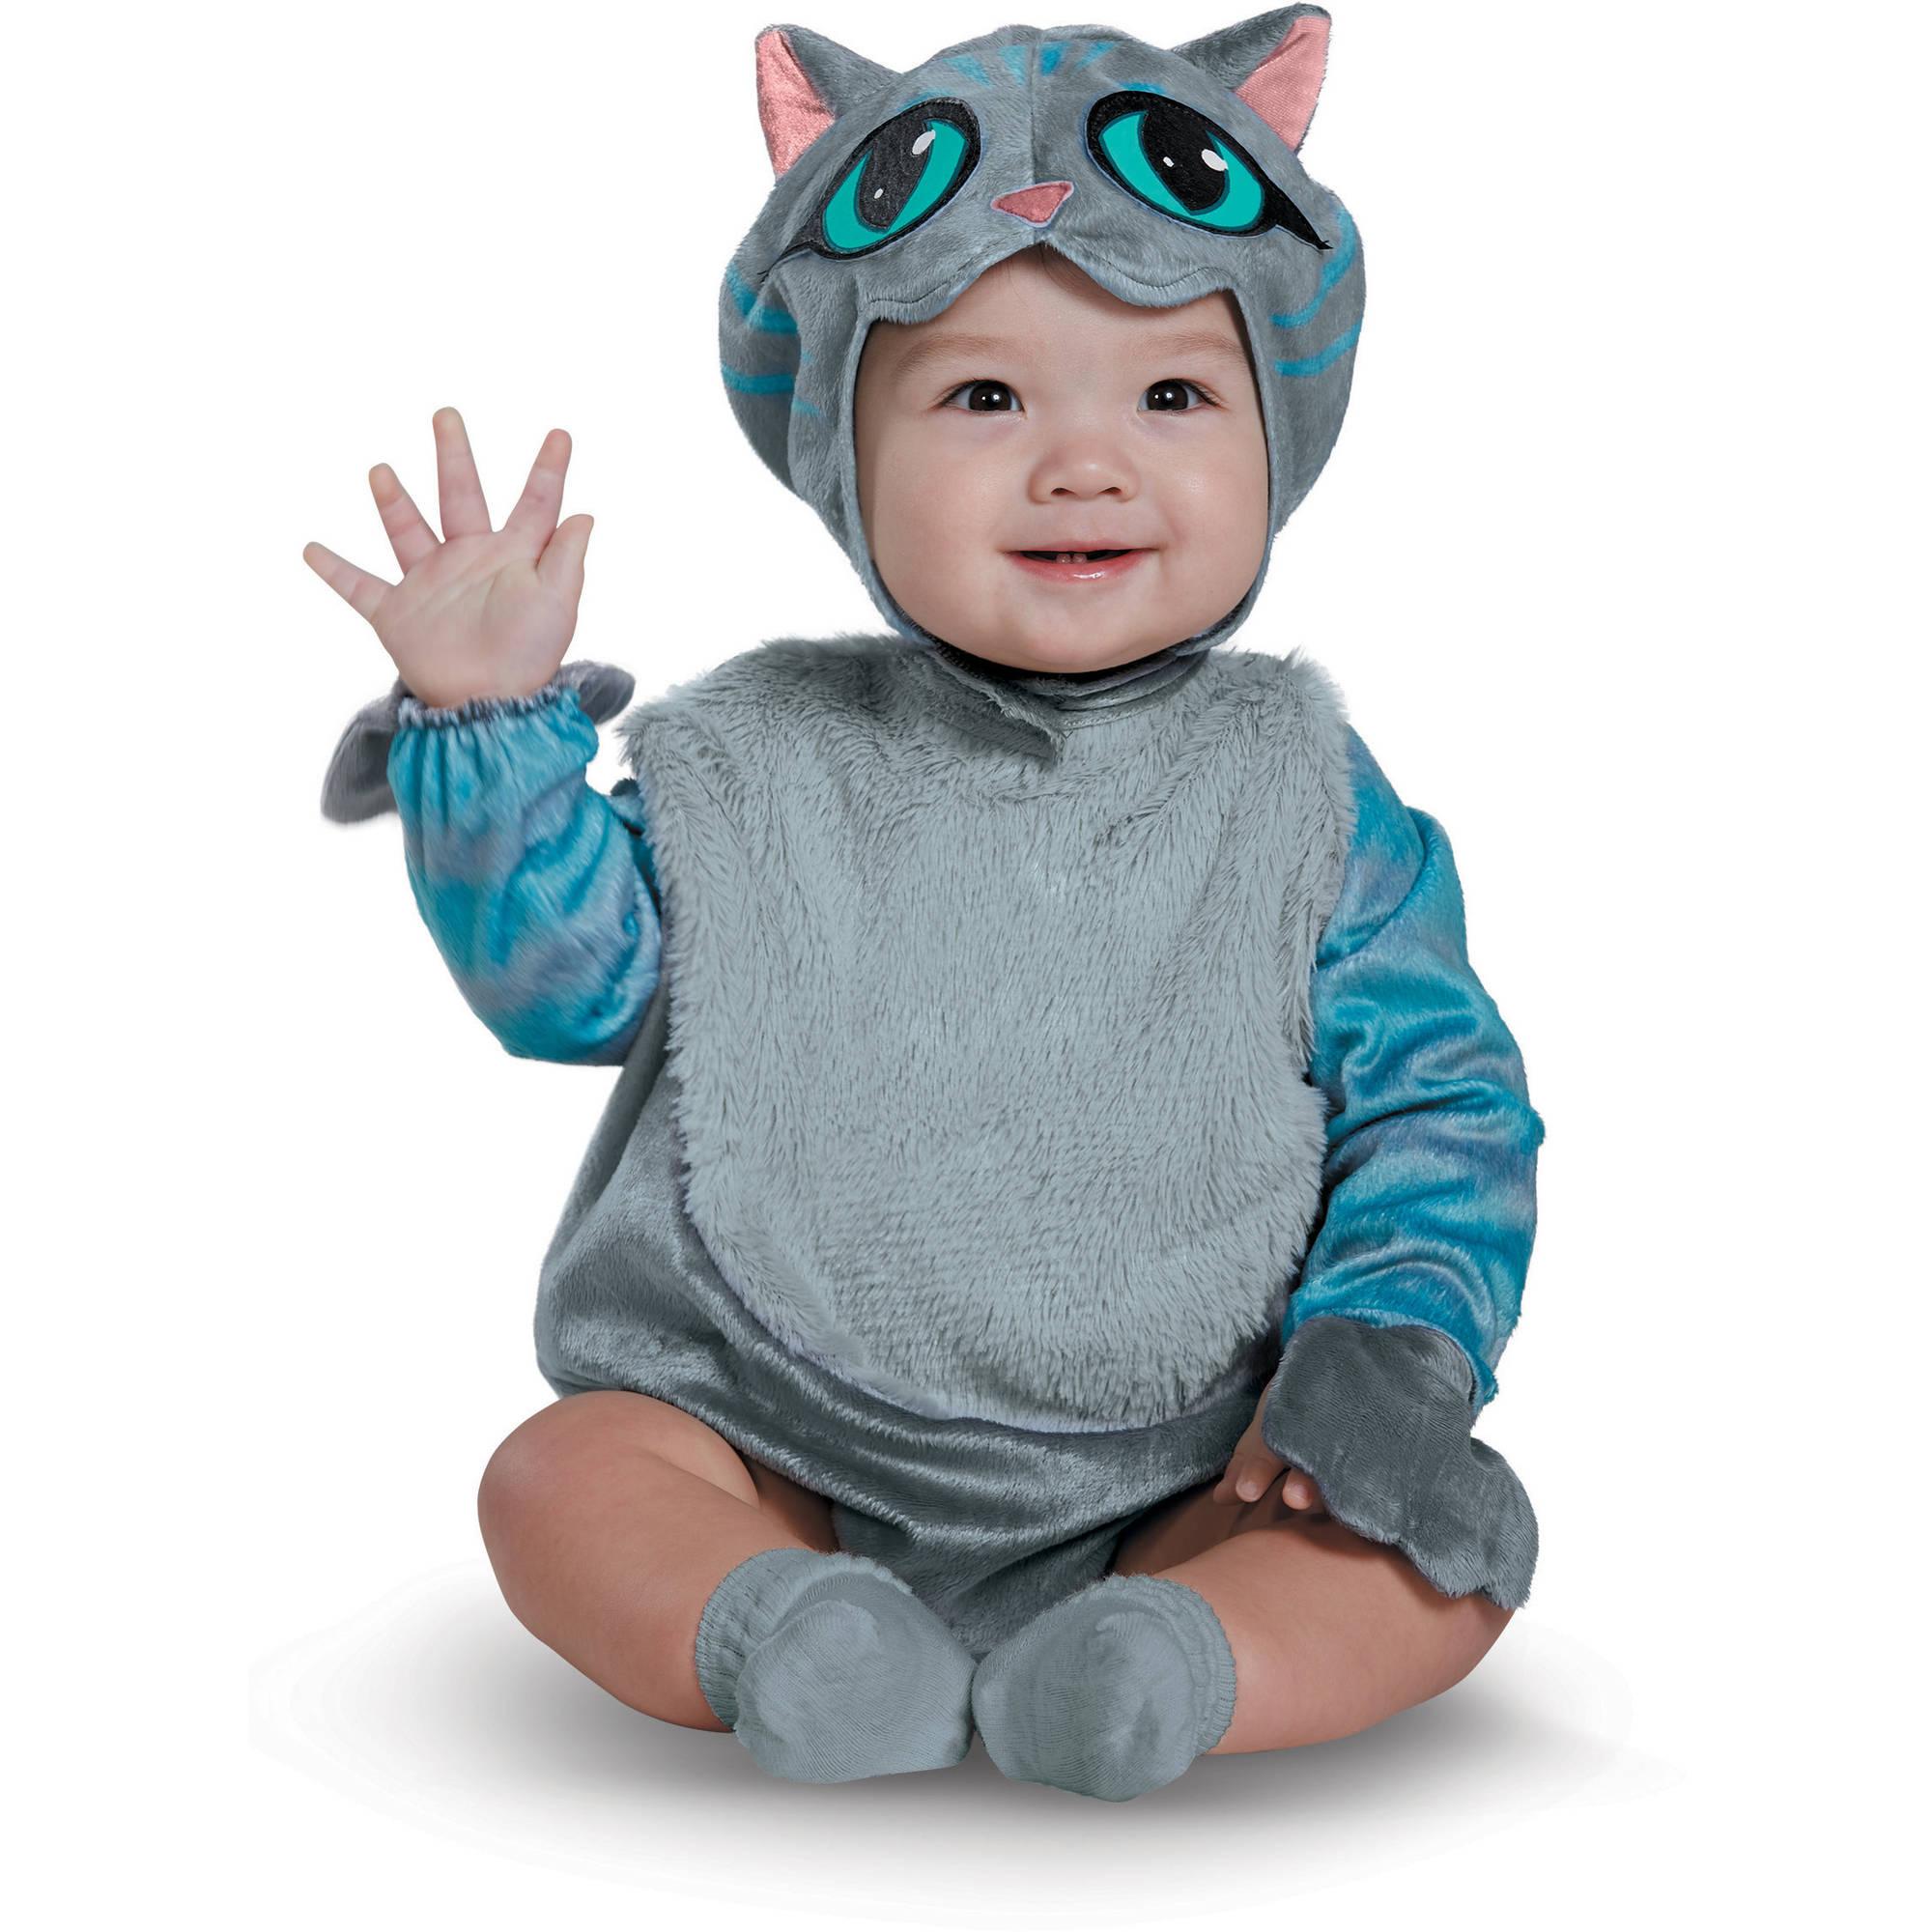 Disney Alice Through the Looking Glass Cheshire Cat Classic Child Halloween Costume